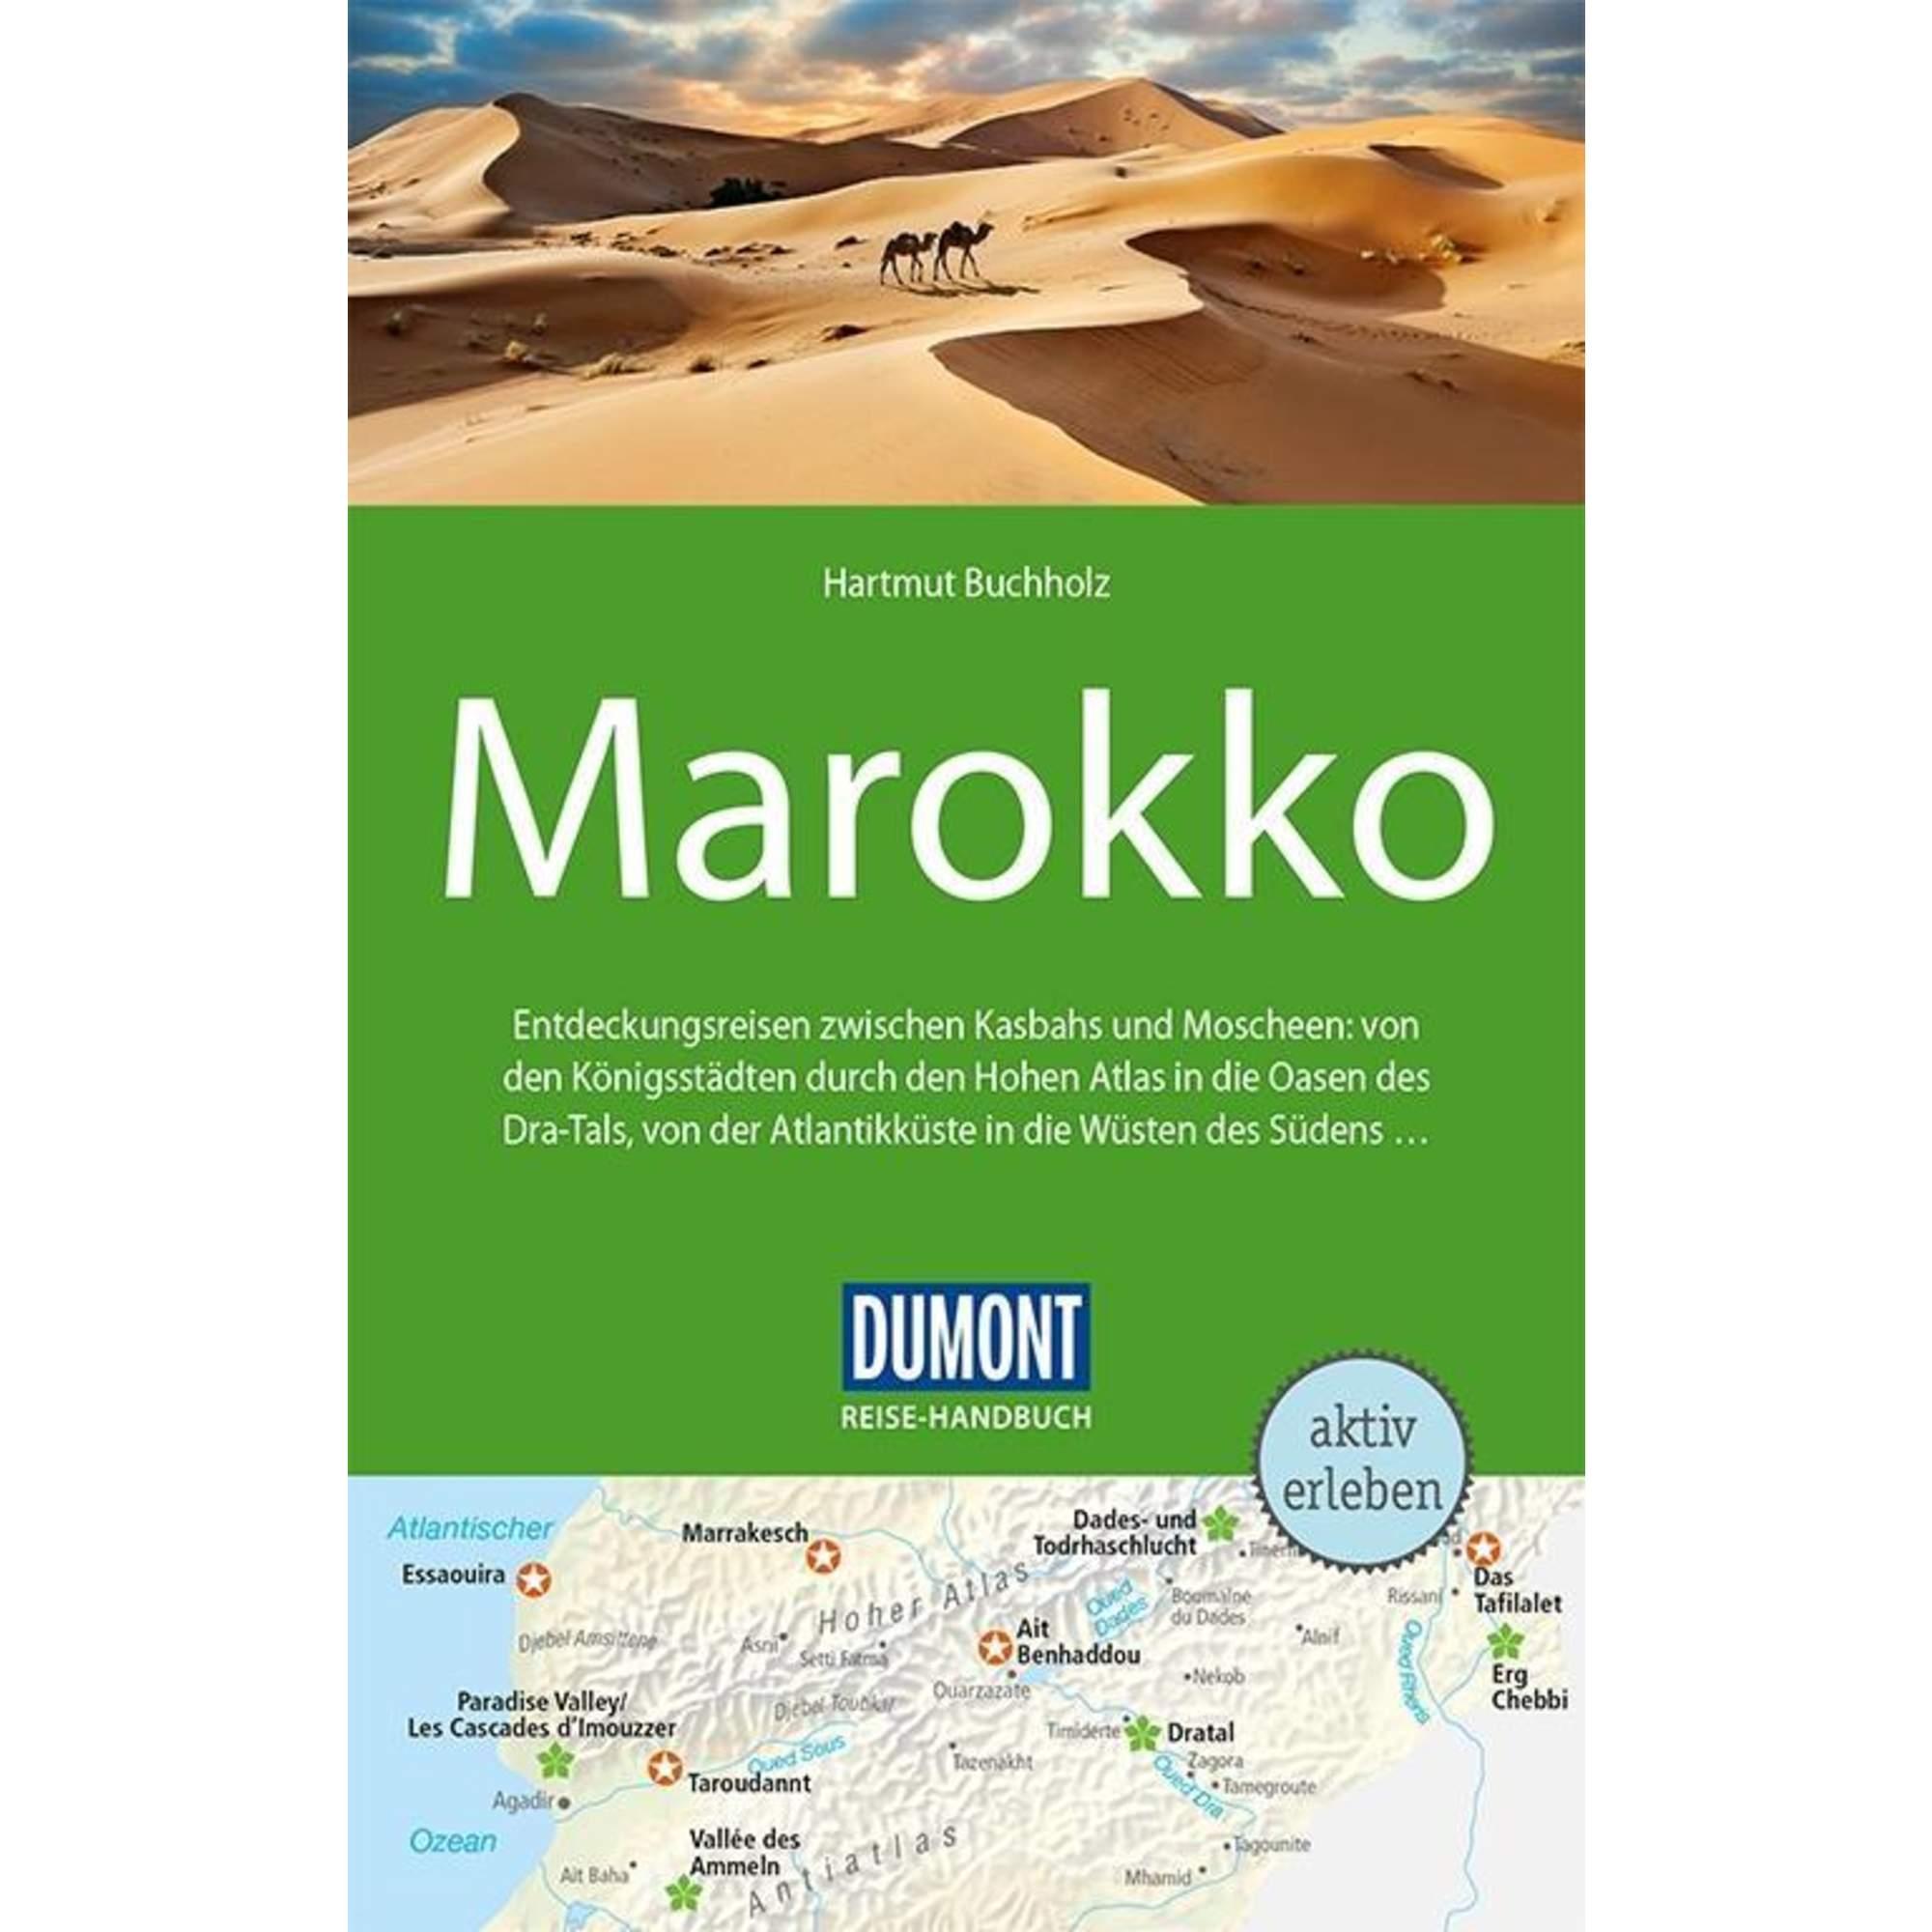 DuMont Reise-Handbuch Reiseführer Marokko, 24,99 Euro